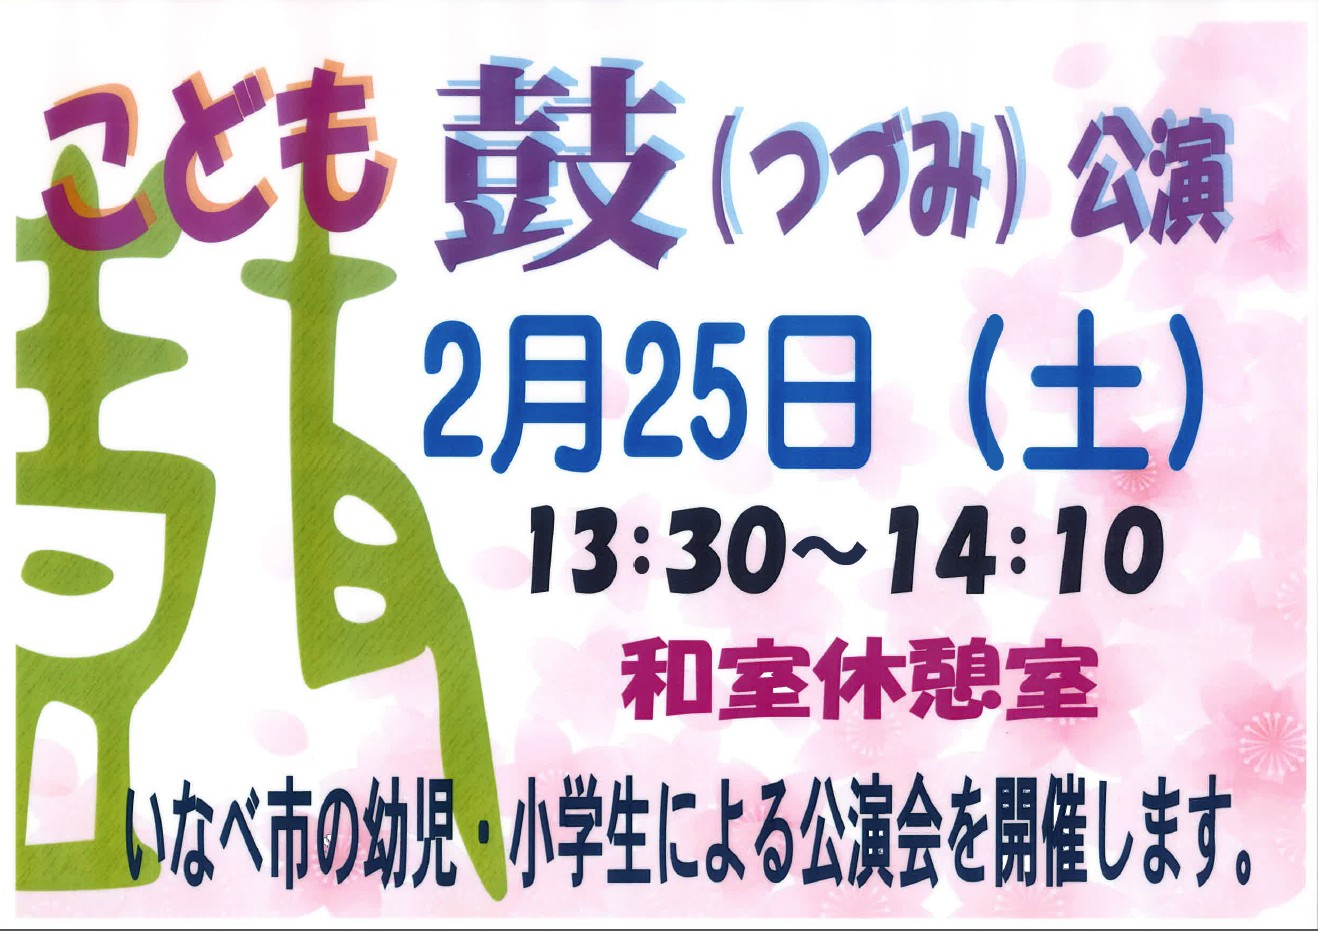 http://www.ajisainosato.com/info/images/2017y02m05d_200333954.jpg